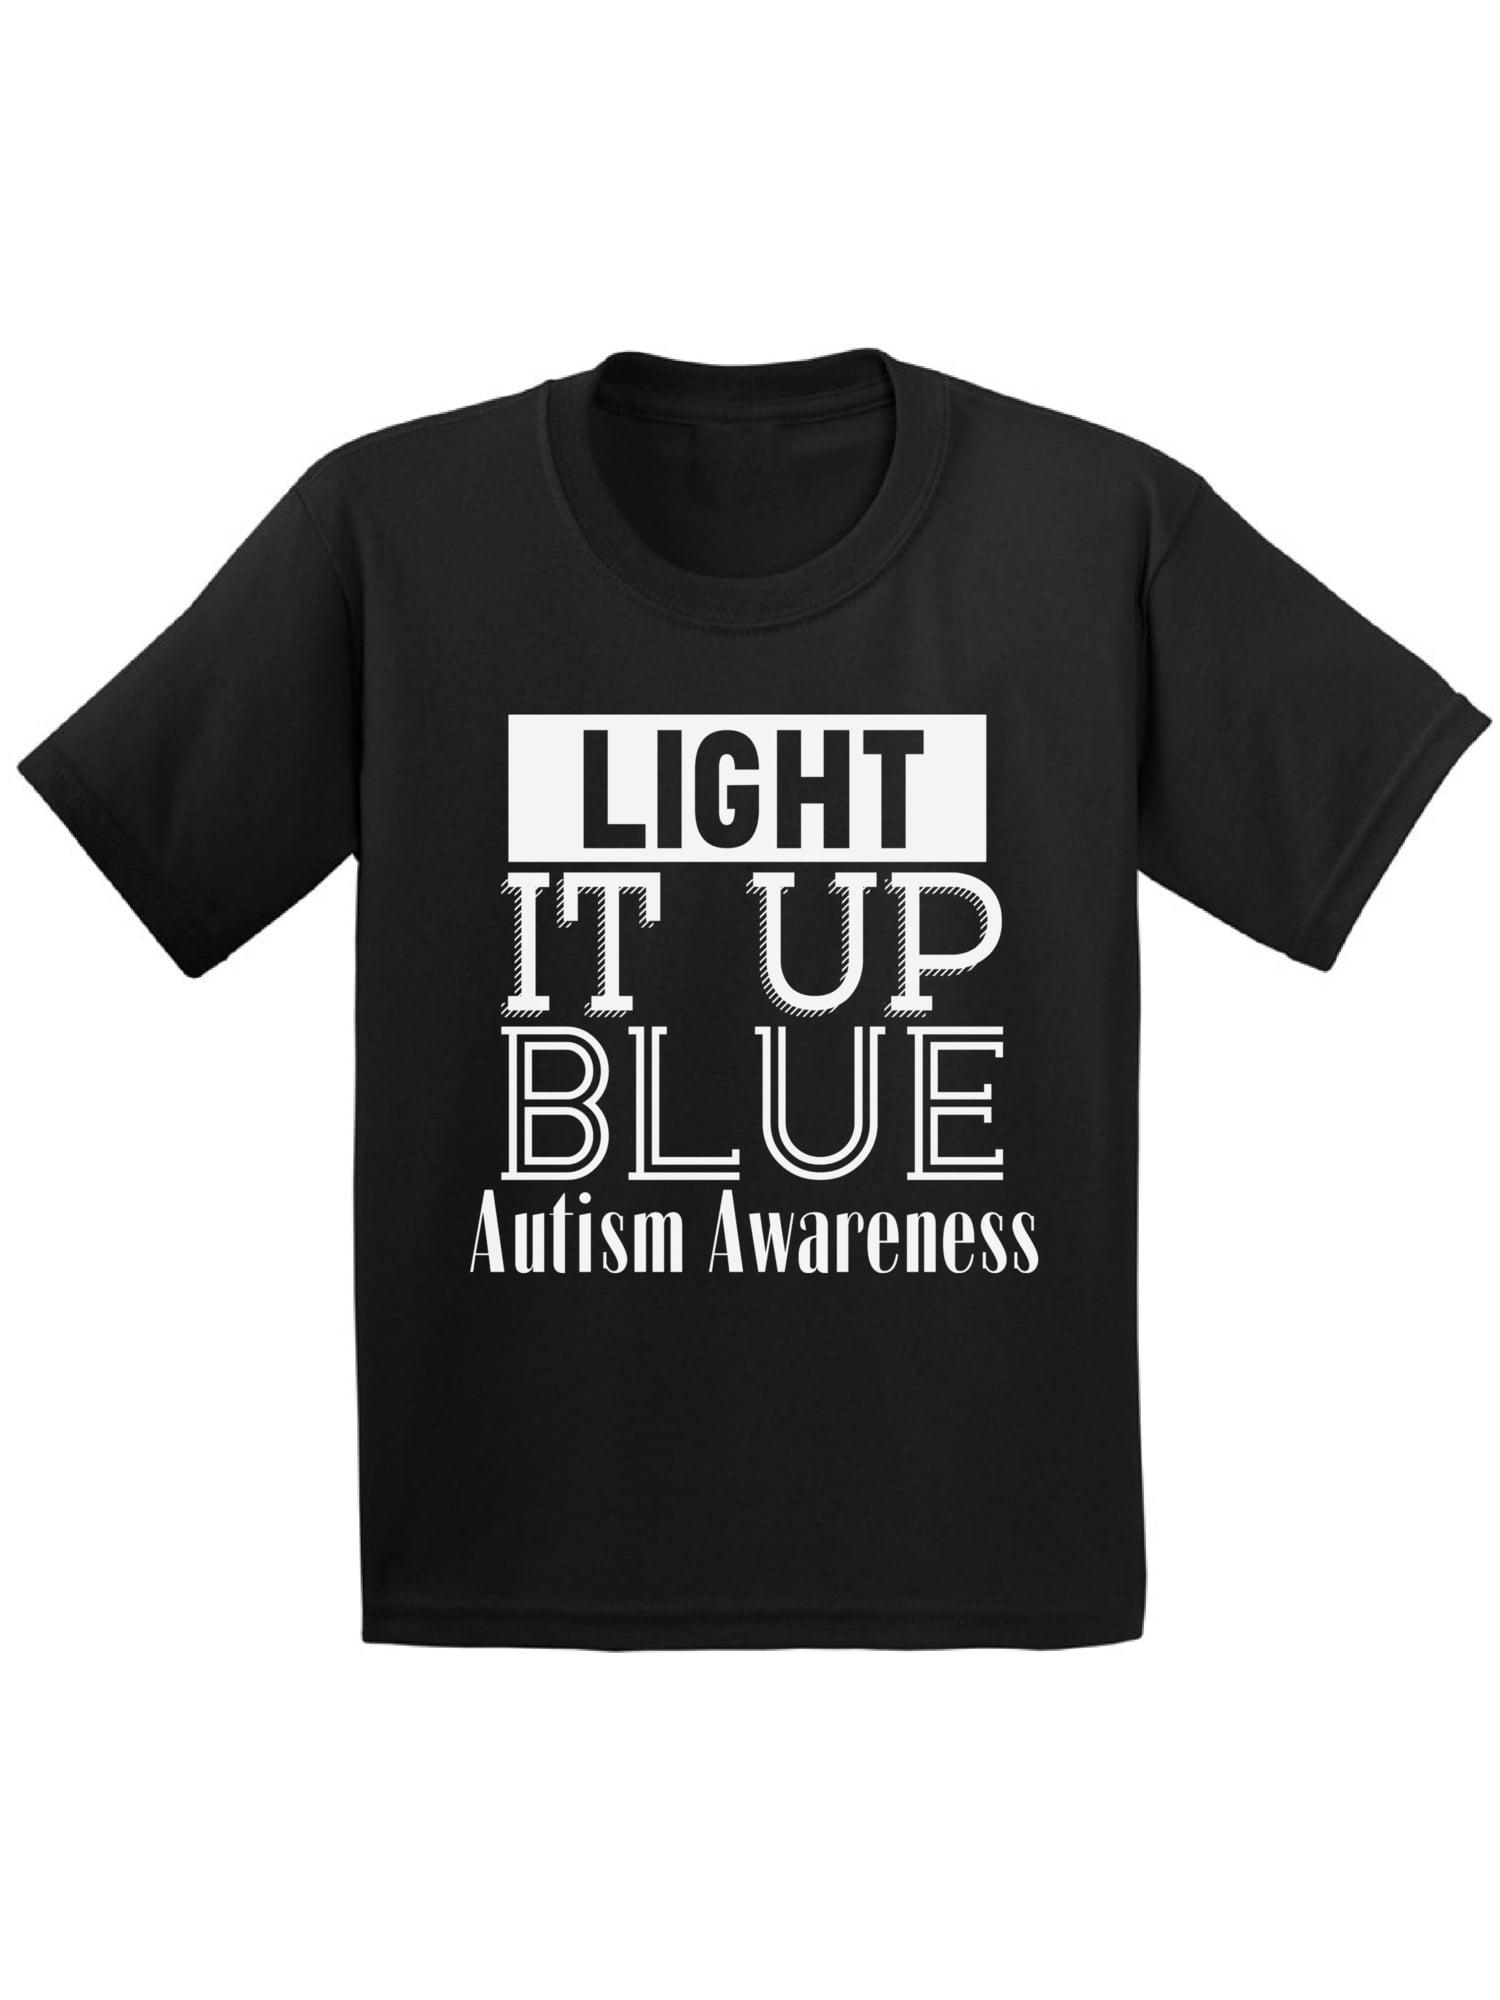 Awkward Styles Light It Up Blue Autism Awareness Shirt for Toddlers Autism Awareness Kids Tshirt Autism Shirt for Kids Autism Gifts for Boys and Girls Light It Up Blue Shirt Blue for Autism T Shirts